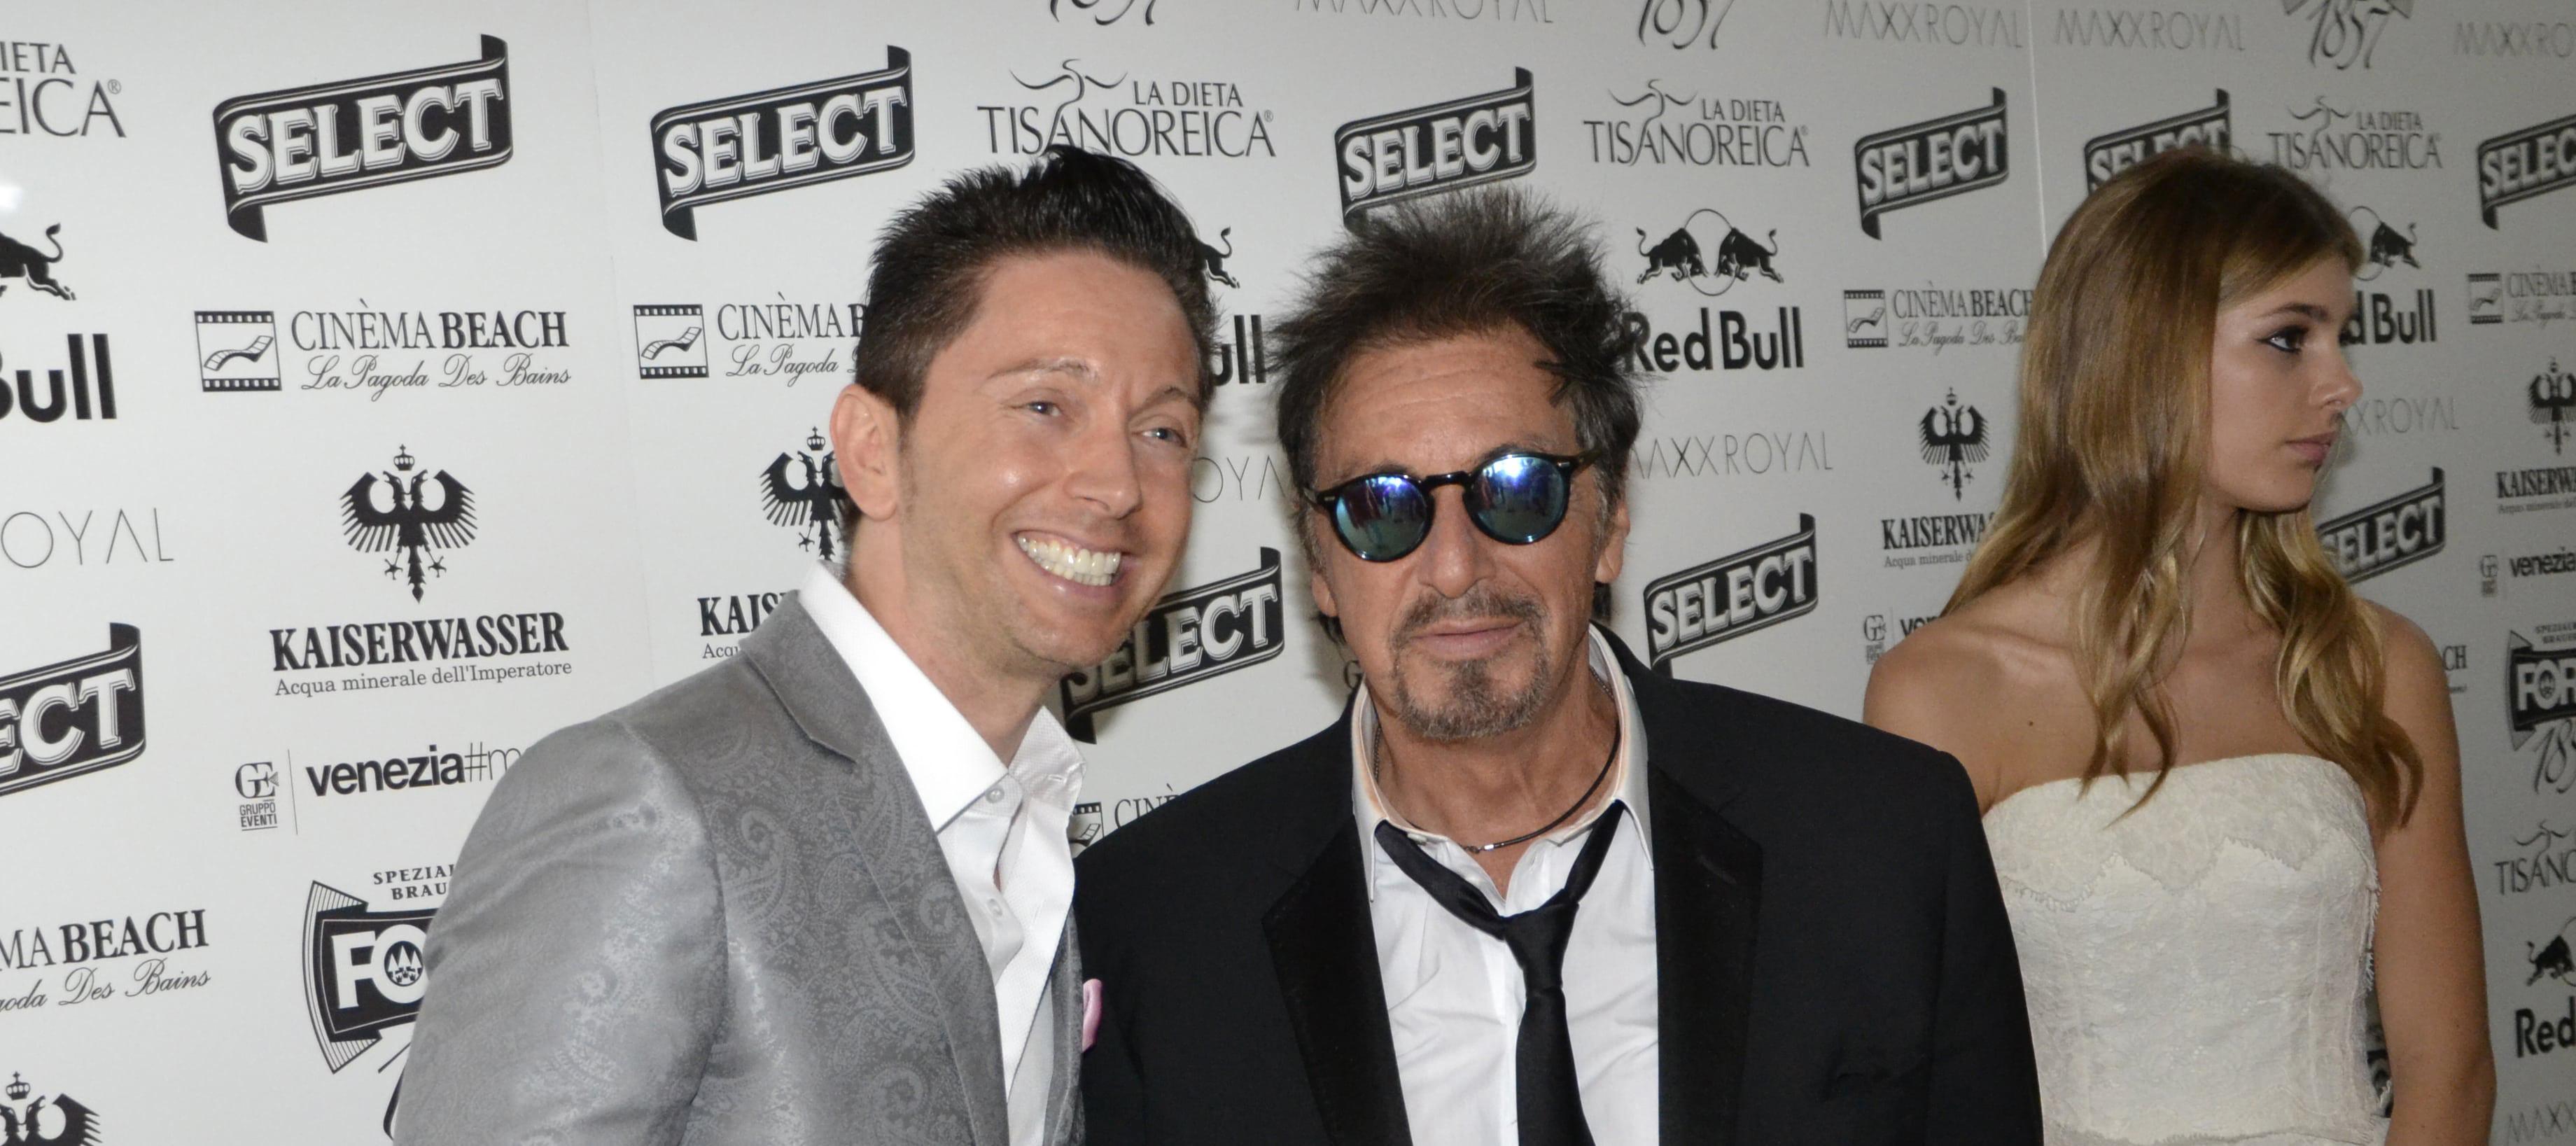 Al Pacino e Gianluca Mech - Festival del Cinema di Venezia